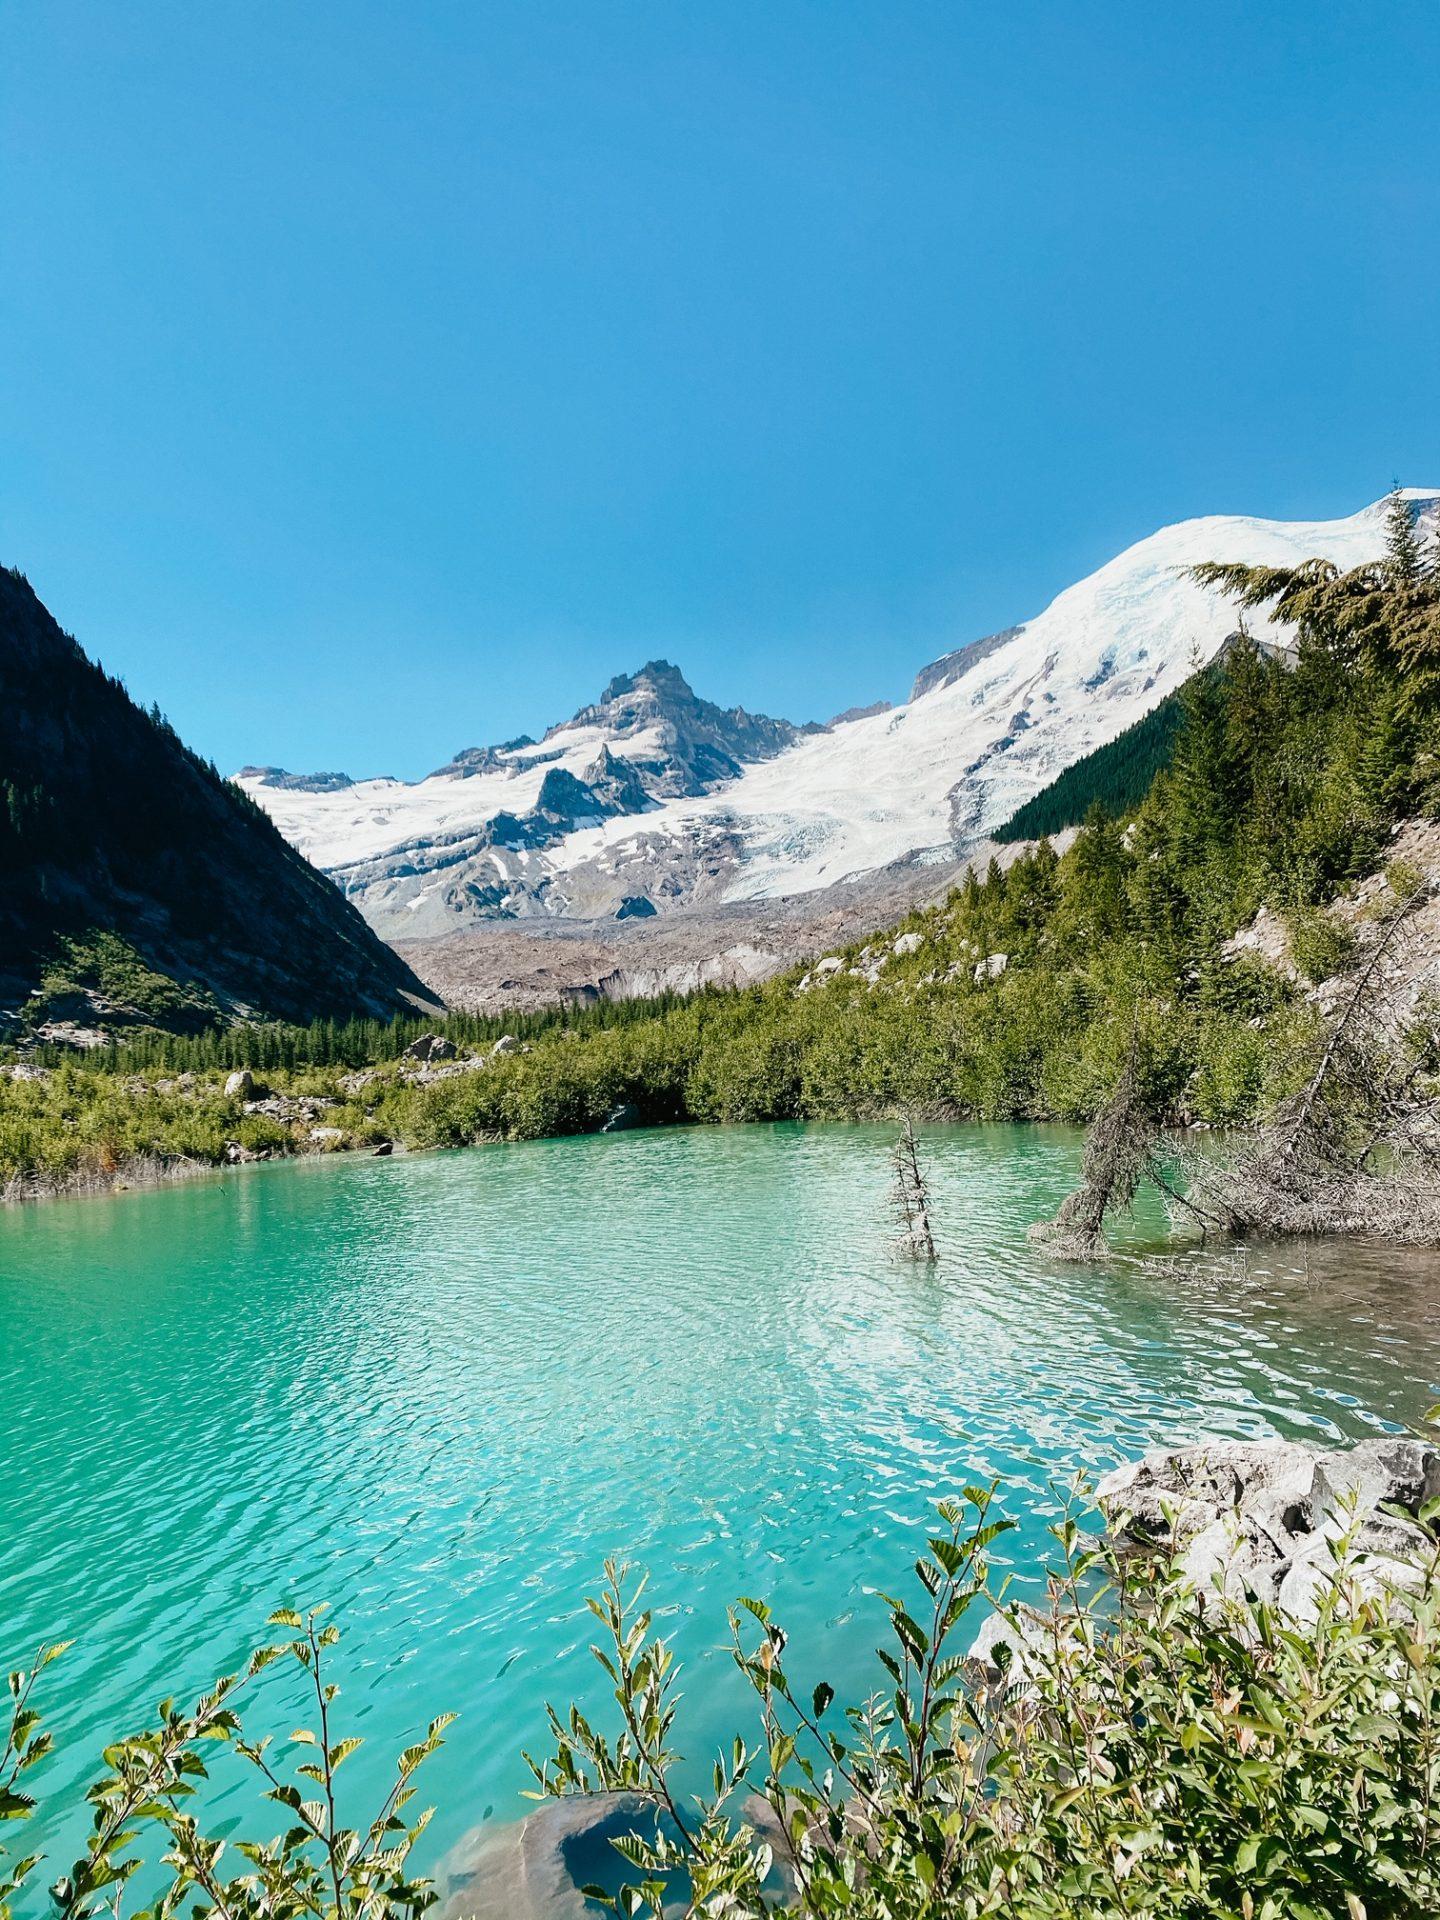 emmons moraine glacier